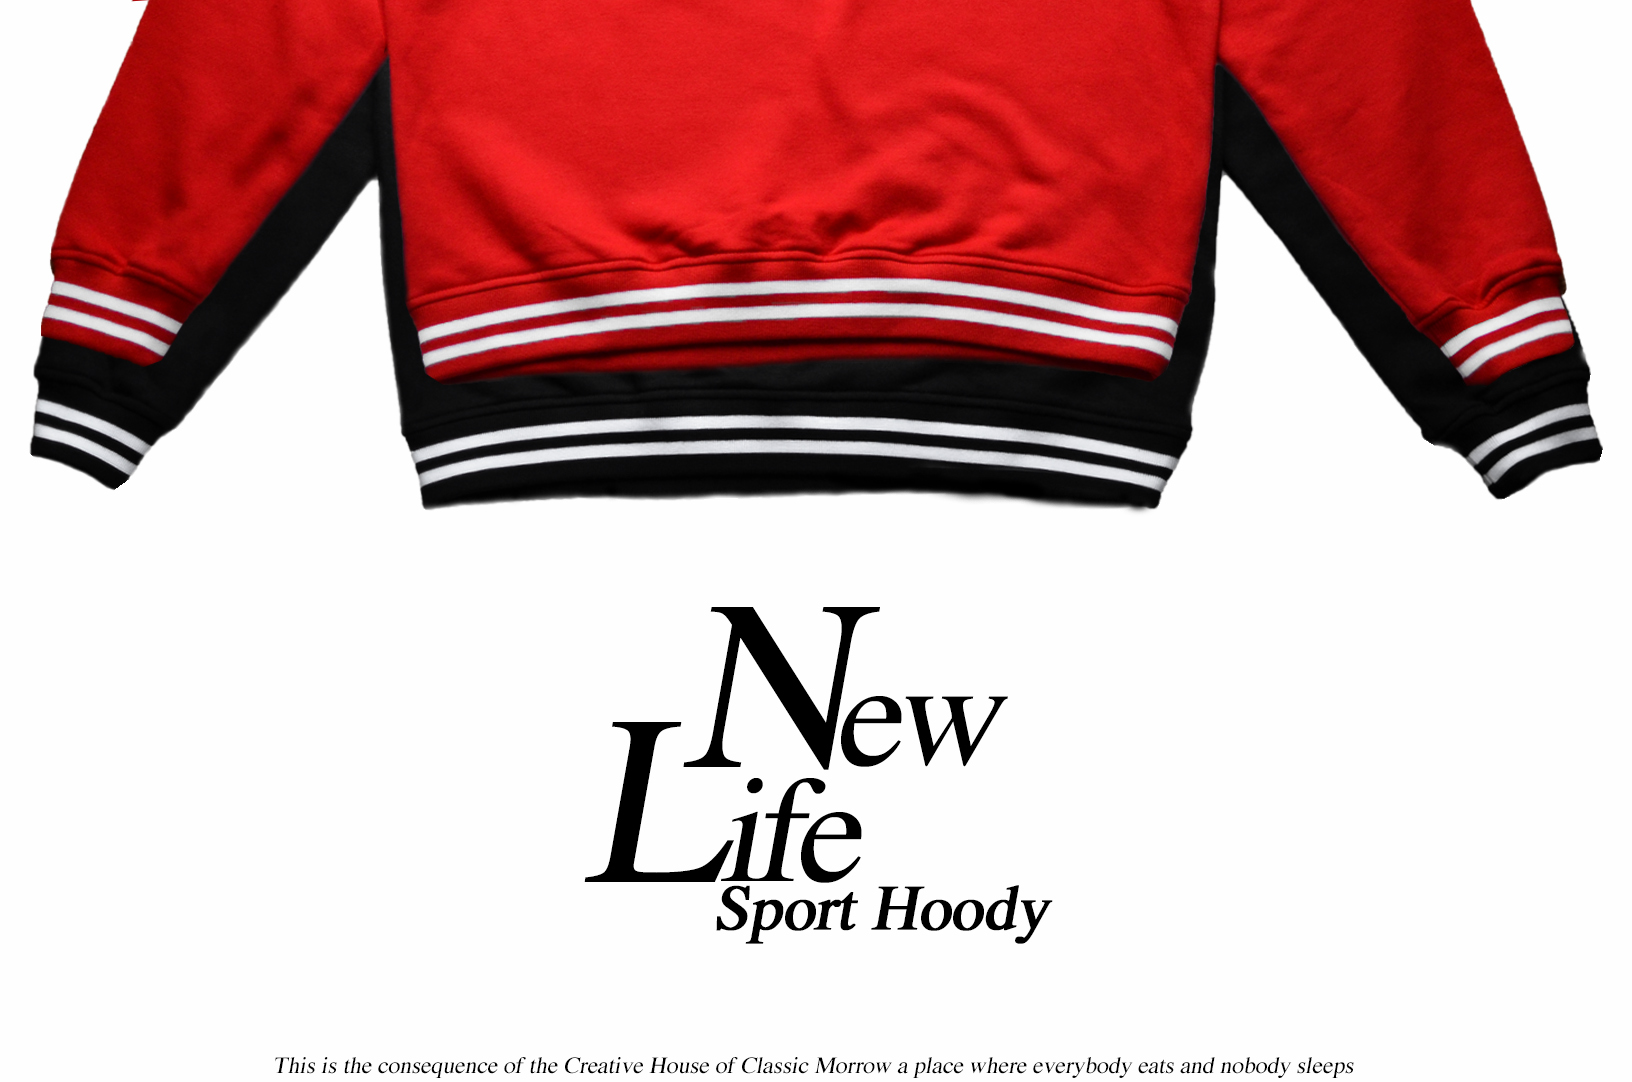 Classic Morrow New Life Hoody